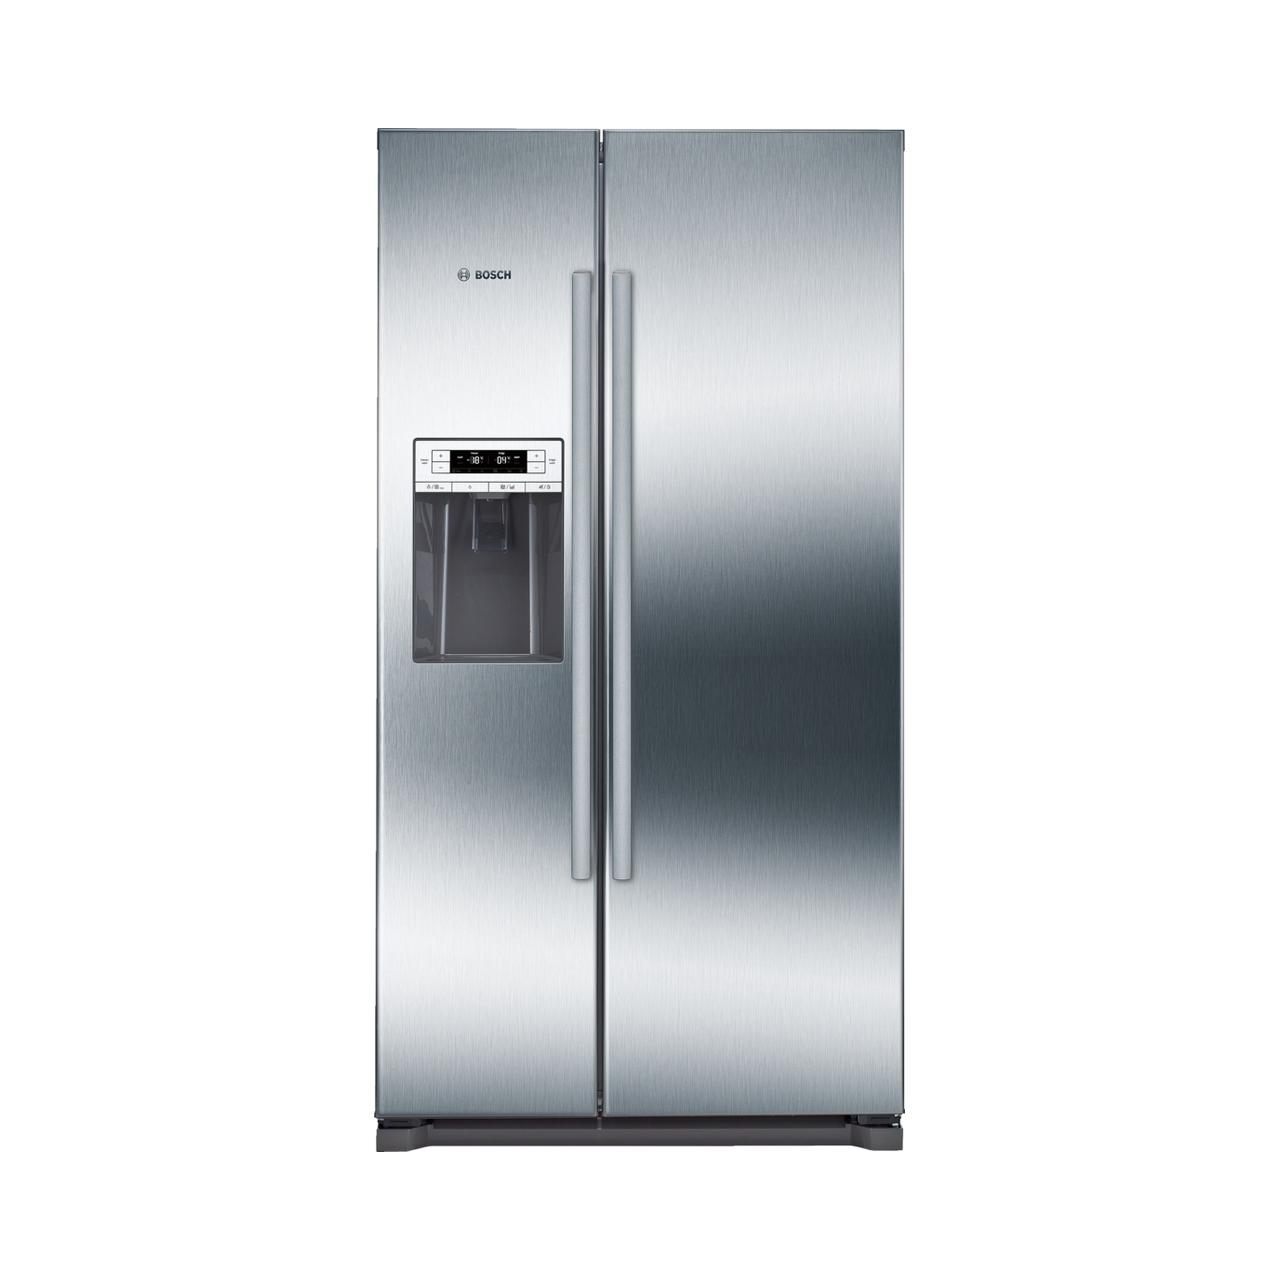 Tủ lạnh side by side BOSCH KAD90VI20 Serie 6